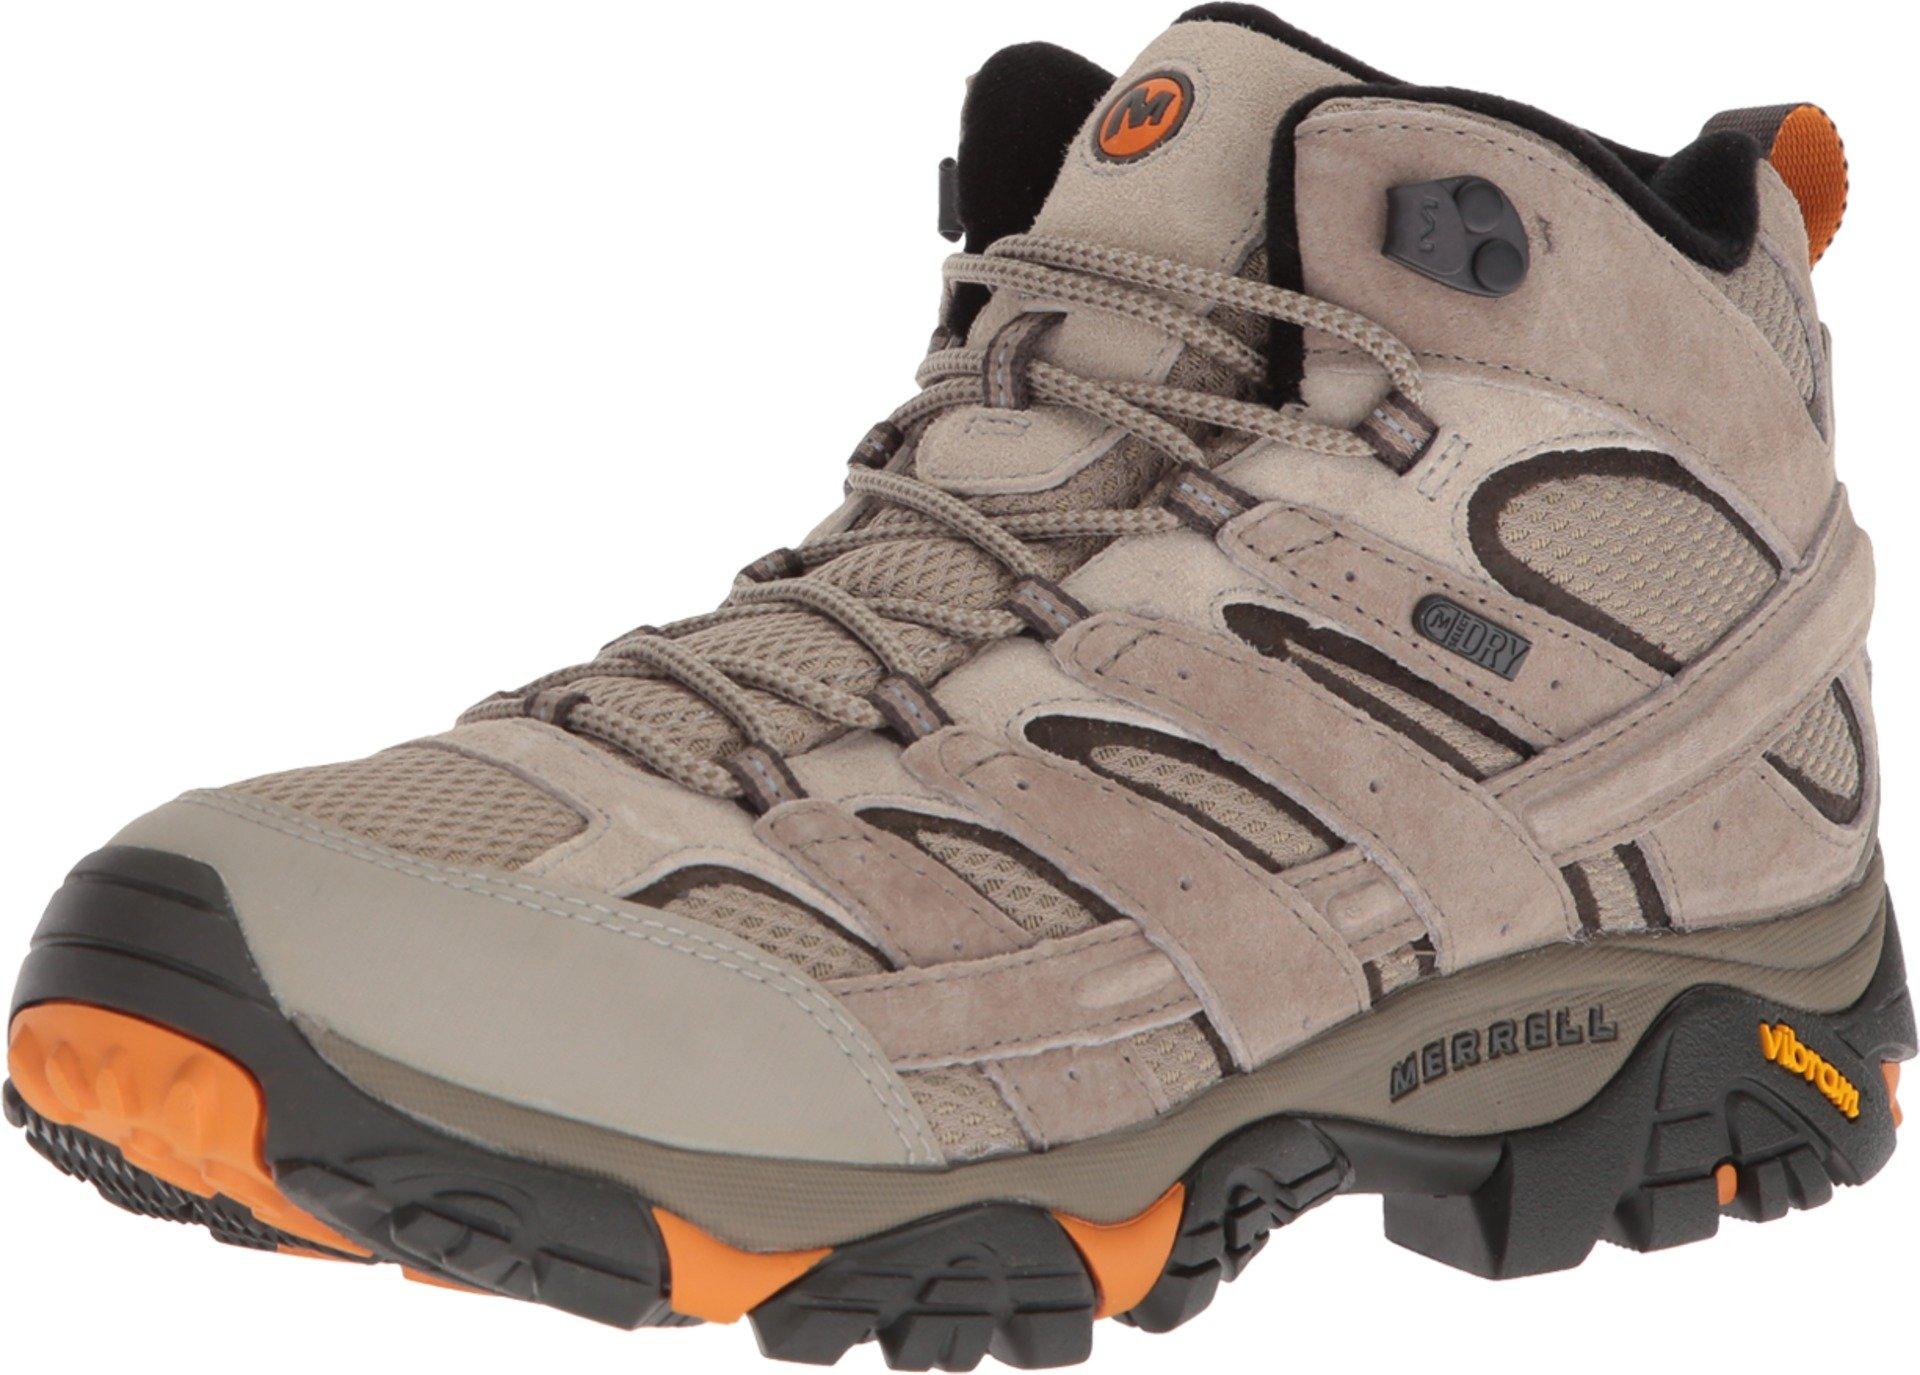 Merrell Men's Moab 2 Mid Waterproof Hiking Boot (8 D(M) US, Brindle)